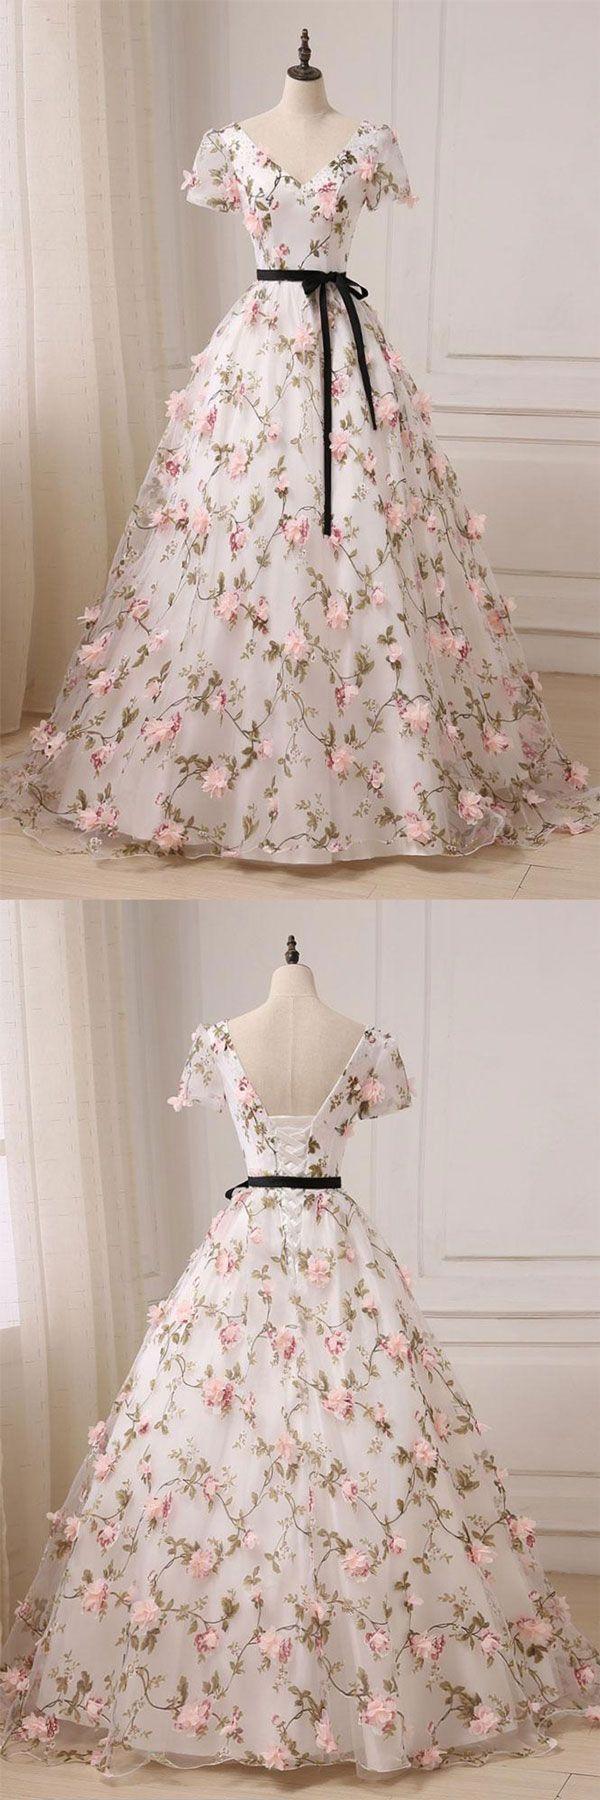 Unique v neck 3D applique long prom dress, evening dress, sweet 16 dress